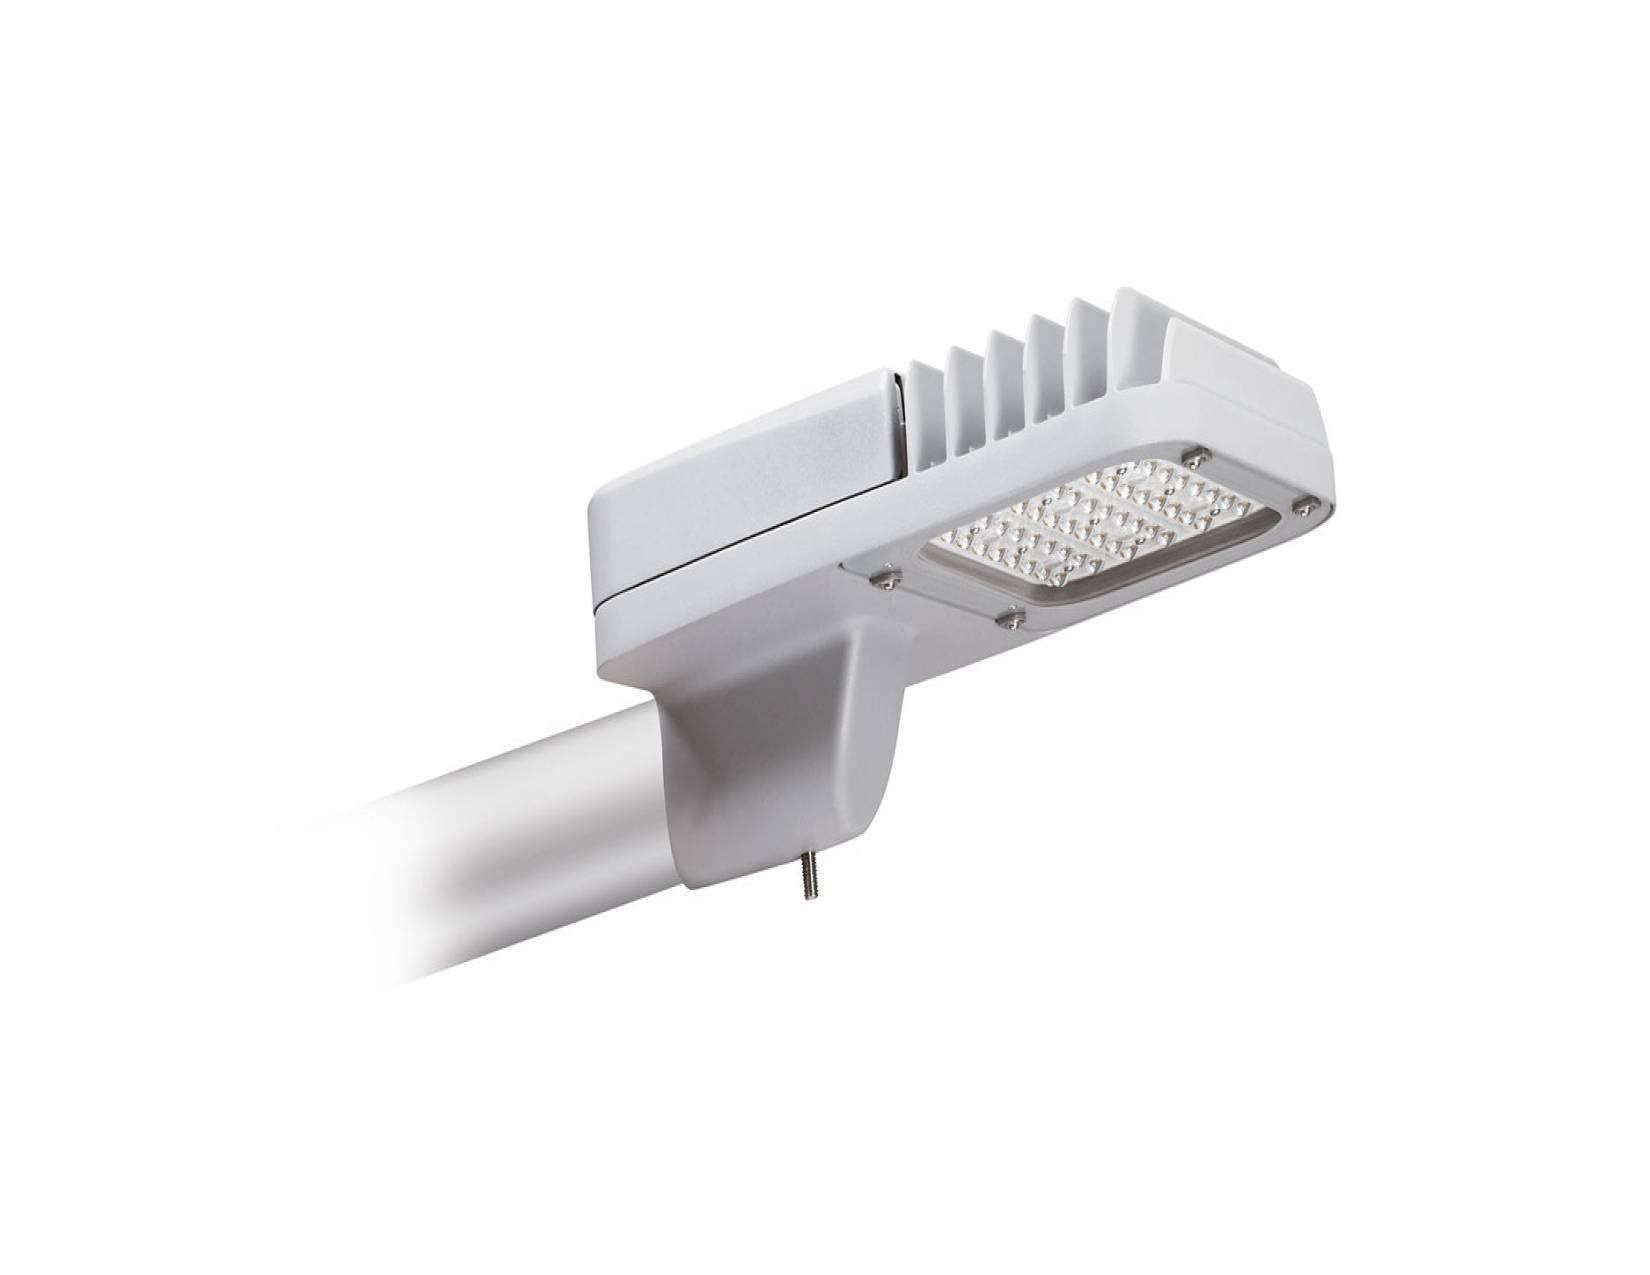 PHILIPS BRP371 LED59/NW 55W 220-240V DM MP1 - Lampu Jalan LED